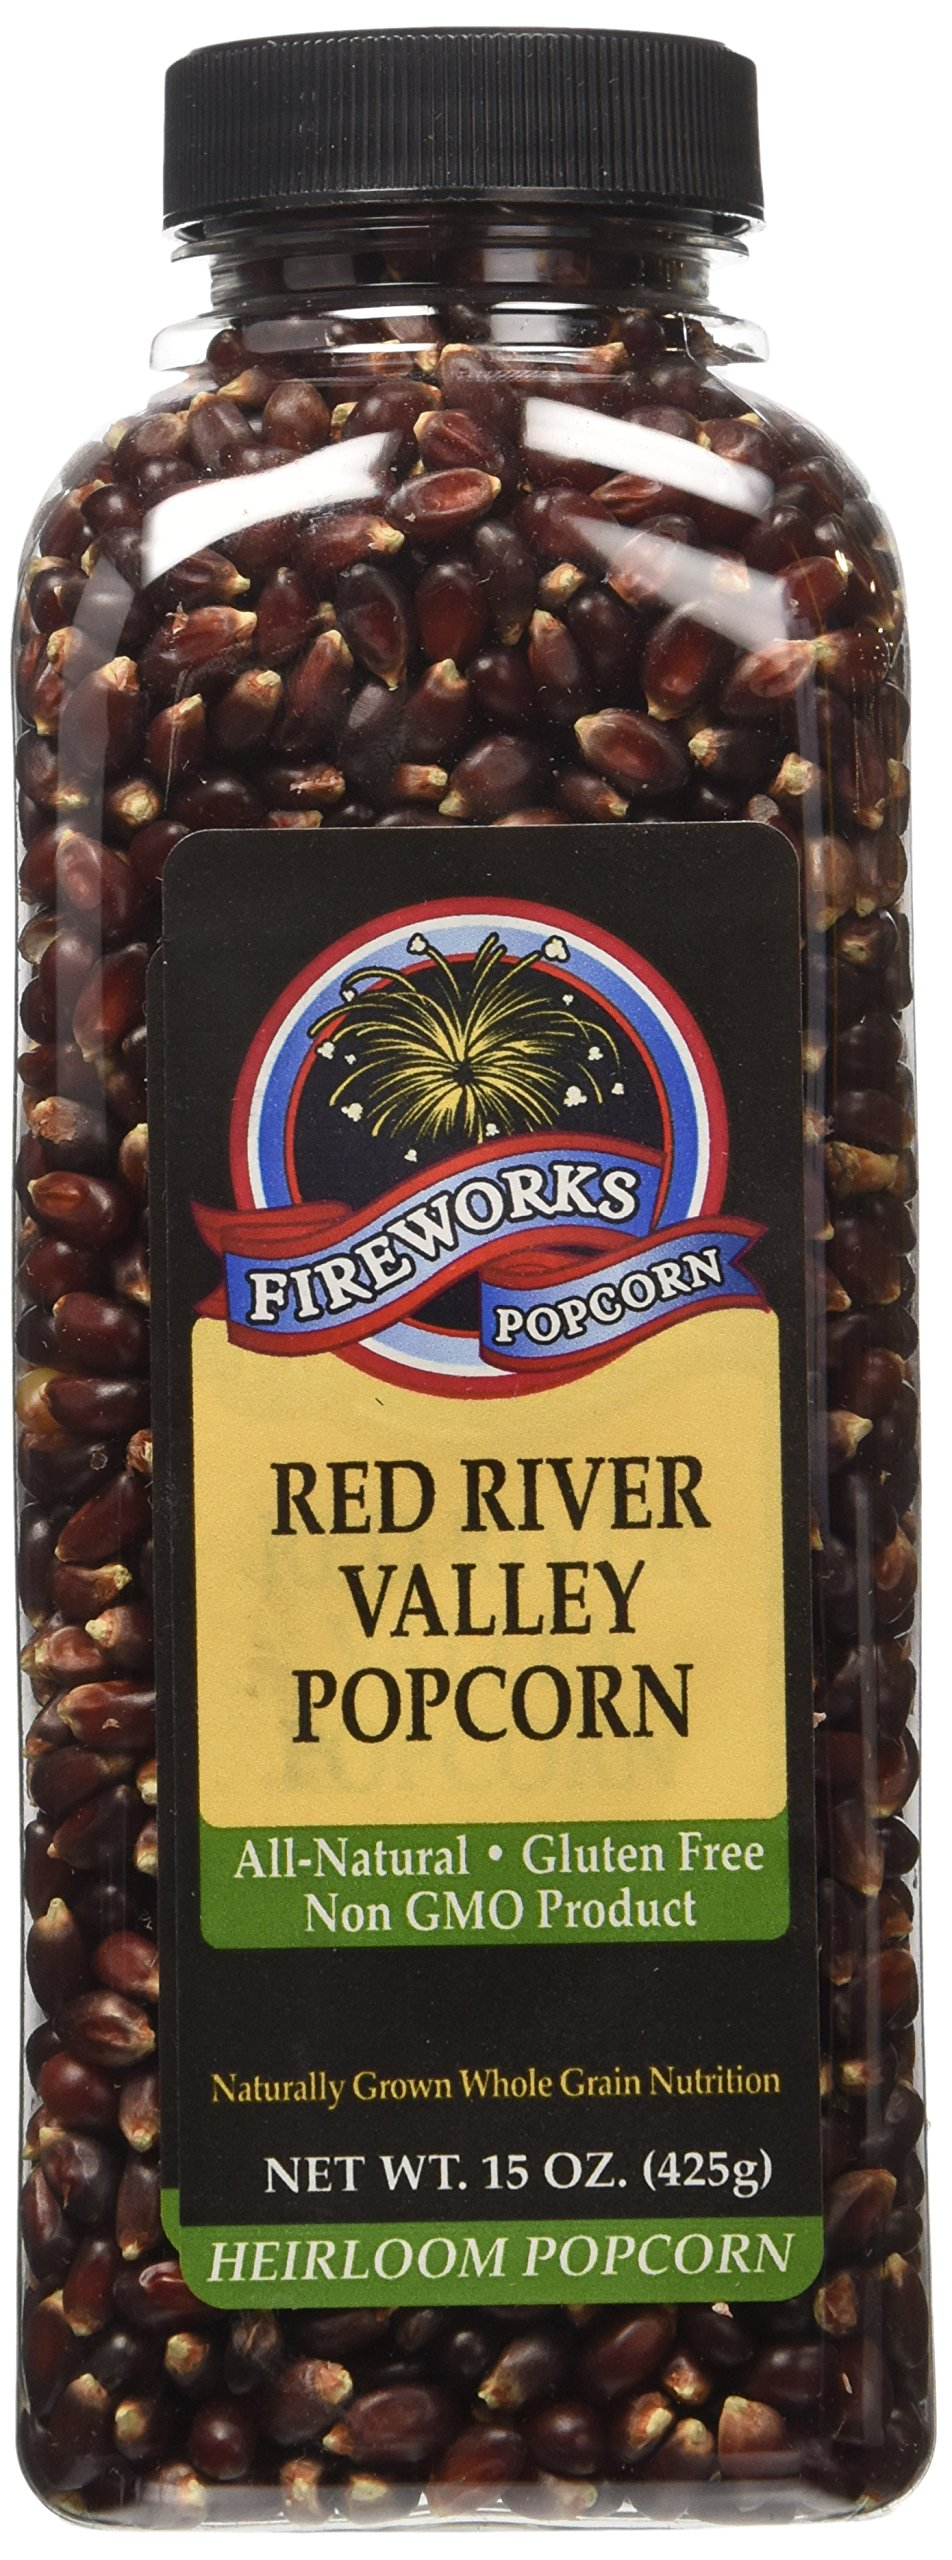 Fireworks Popcorn Red River Valley Popcorn, 15-Ounce Bottles (Pack of 6)